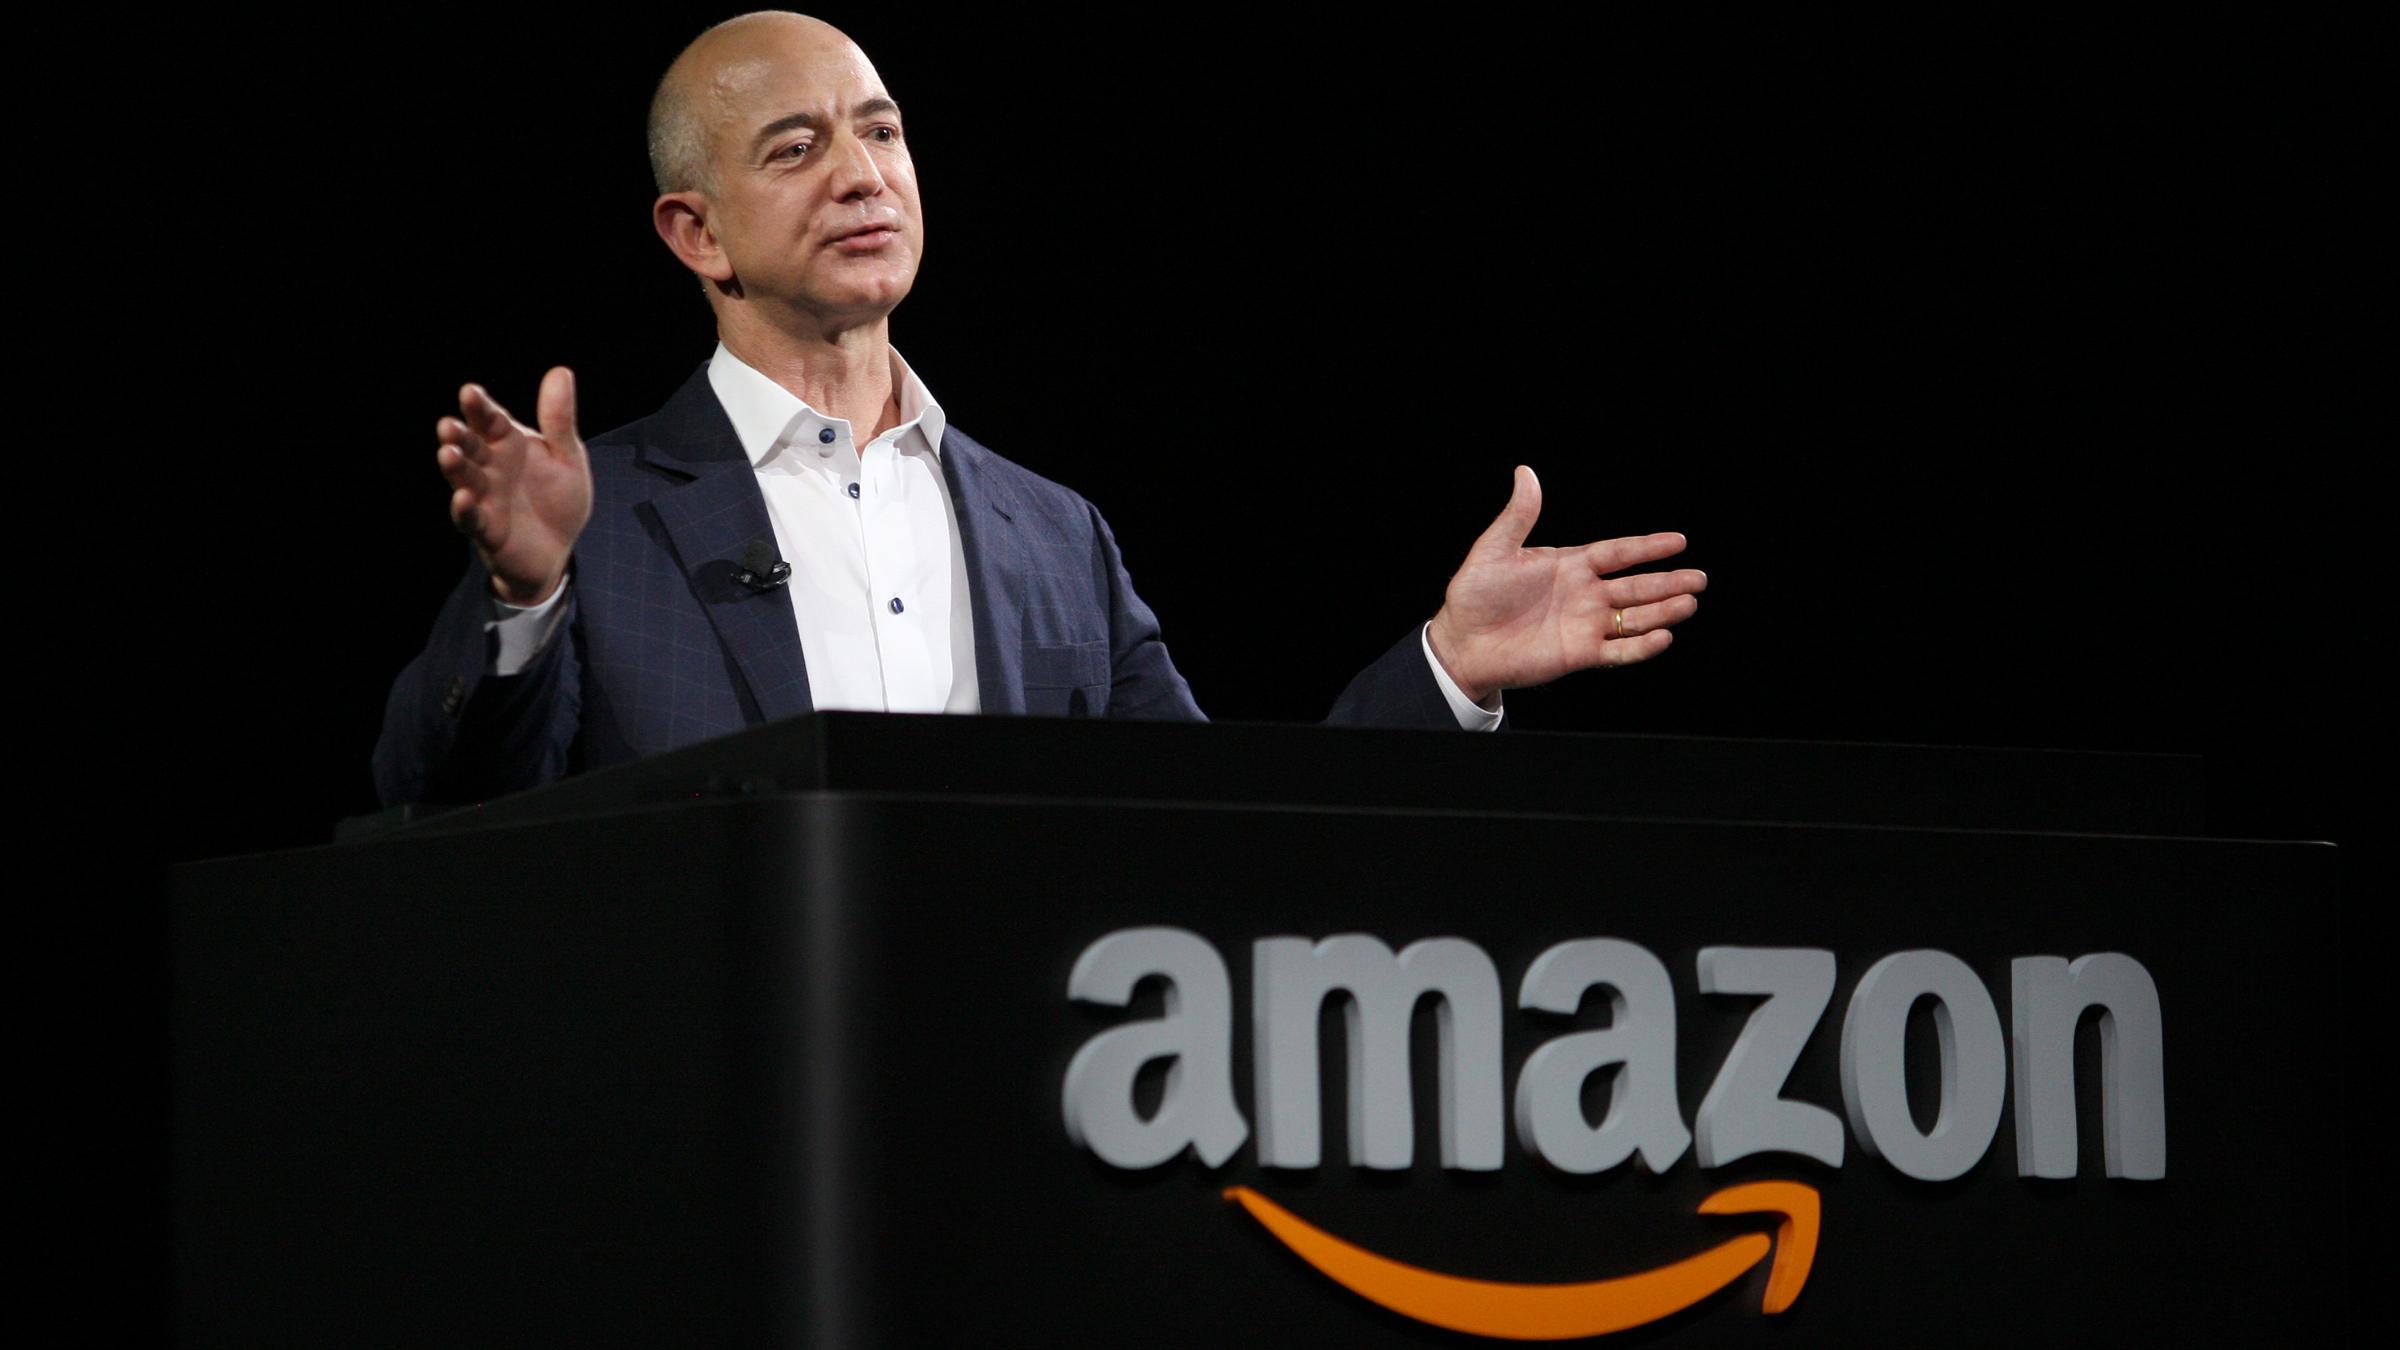 Amazon CEO Jim Bezos